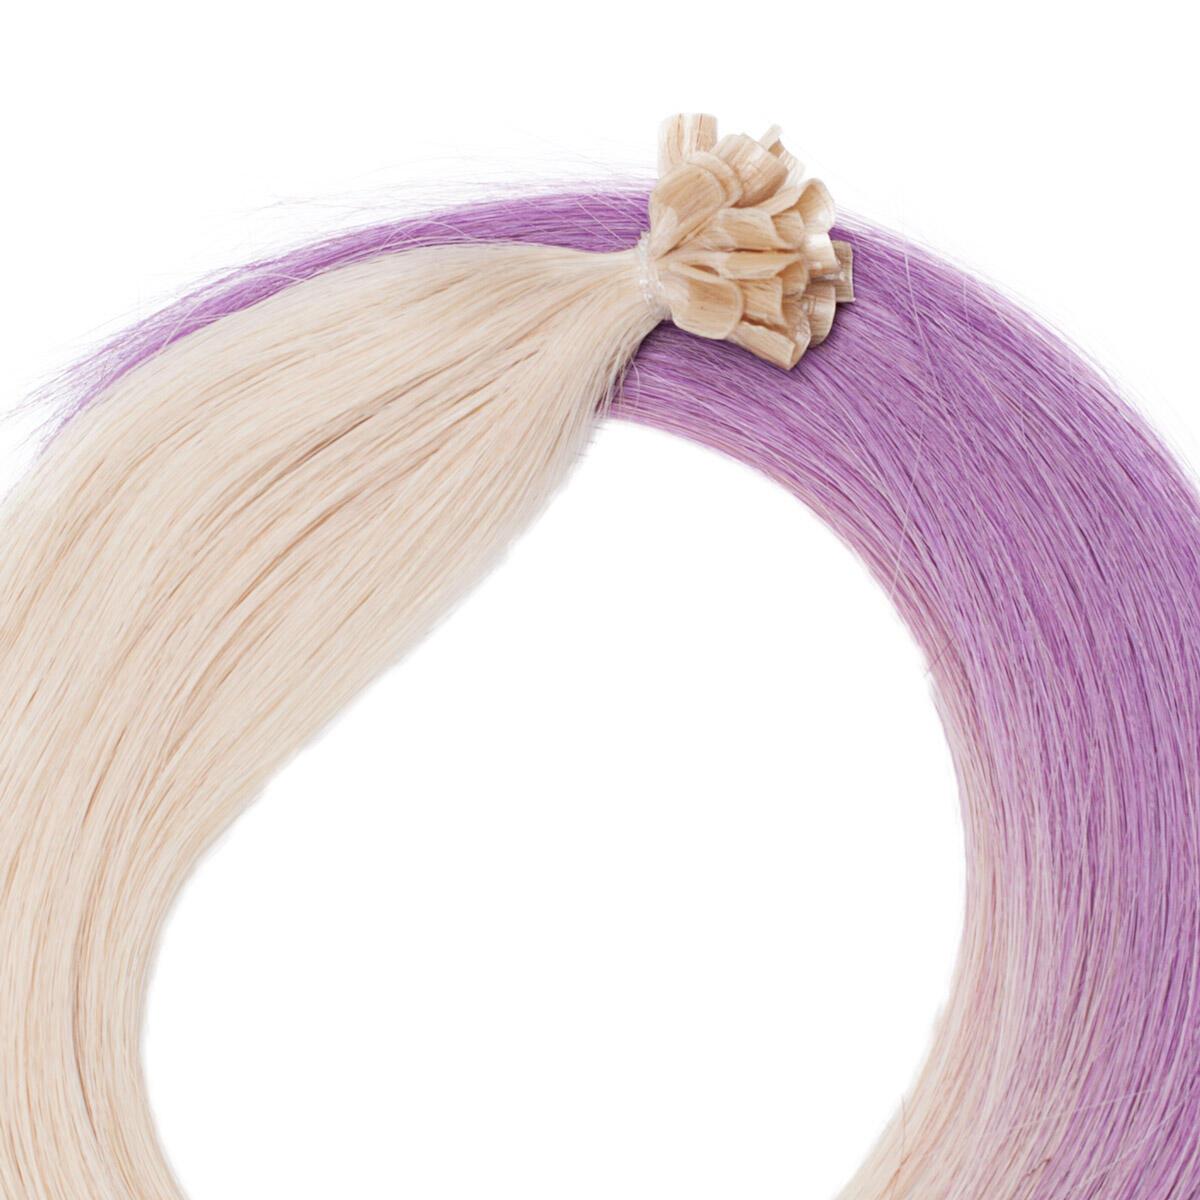 Nail Hair Original O10.8/99.3 Light Purple Ombre 50 cm